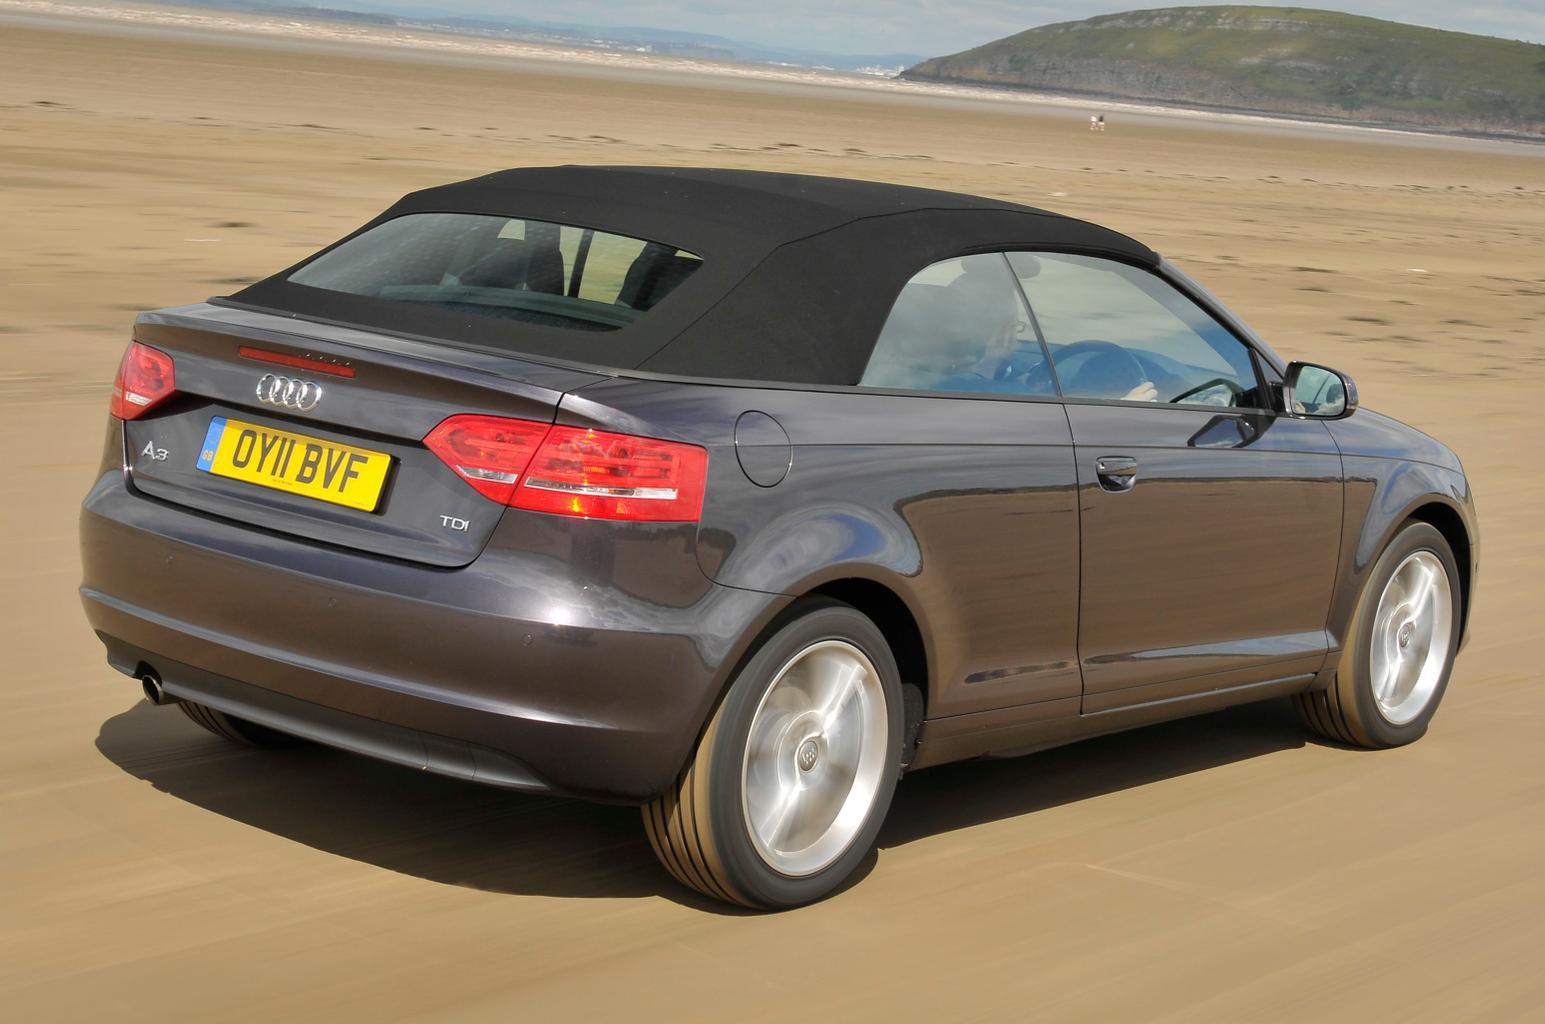 Used test – affordable convertibles: Audi A3 vs Peugeot 308 vs Volkswagen Golf